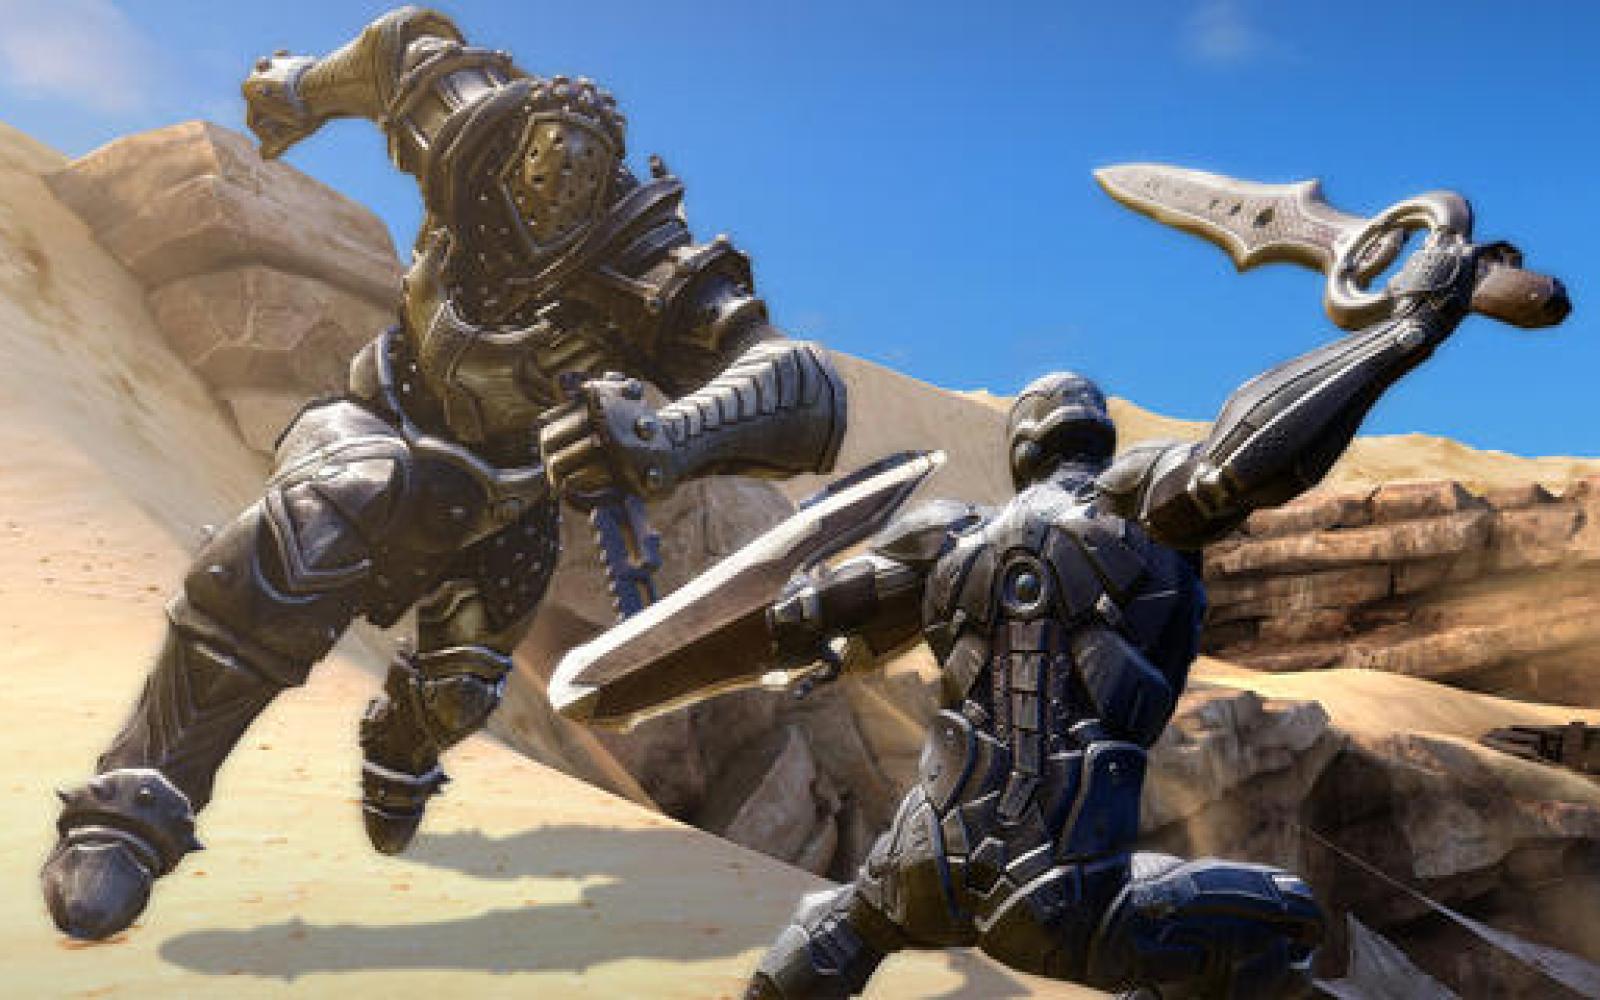 Infinity Blade III debuts on the App Store ahead of iOS 7